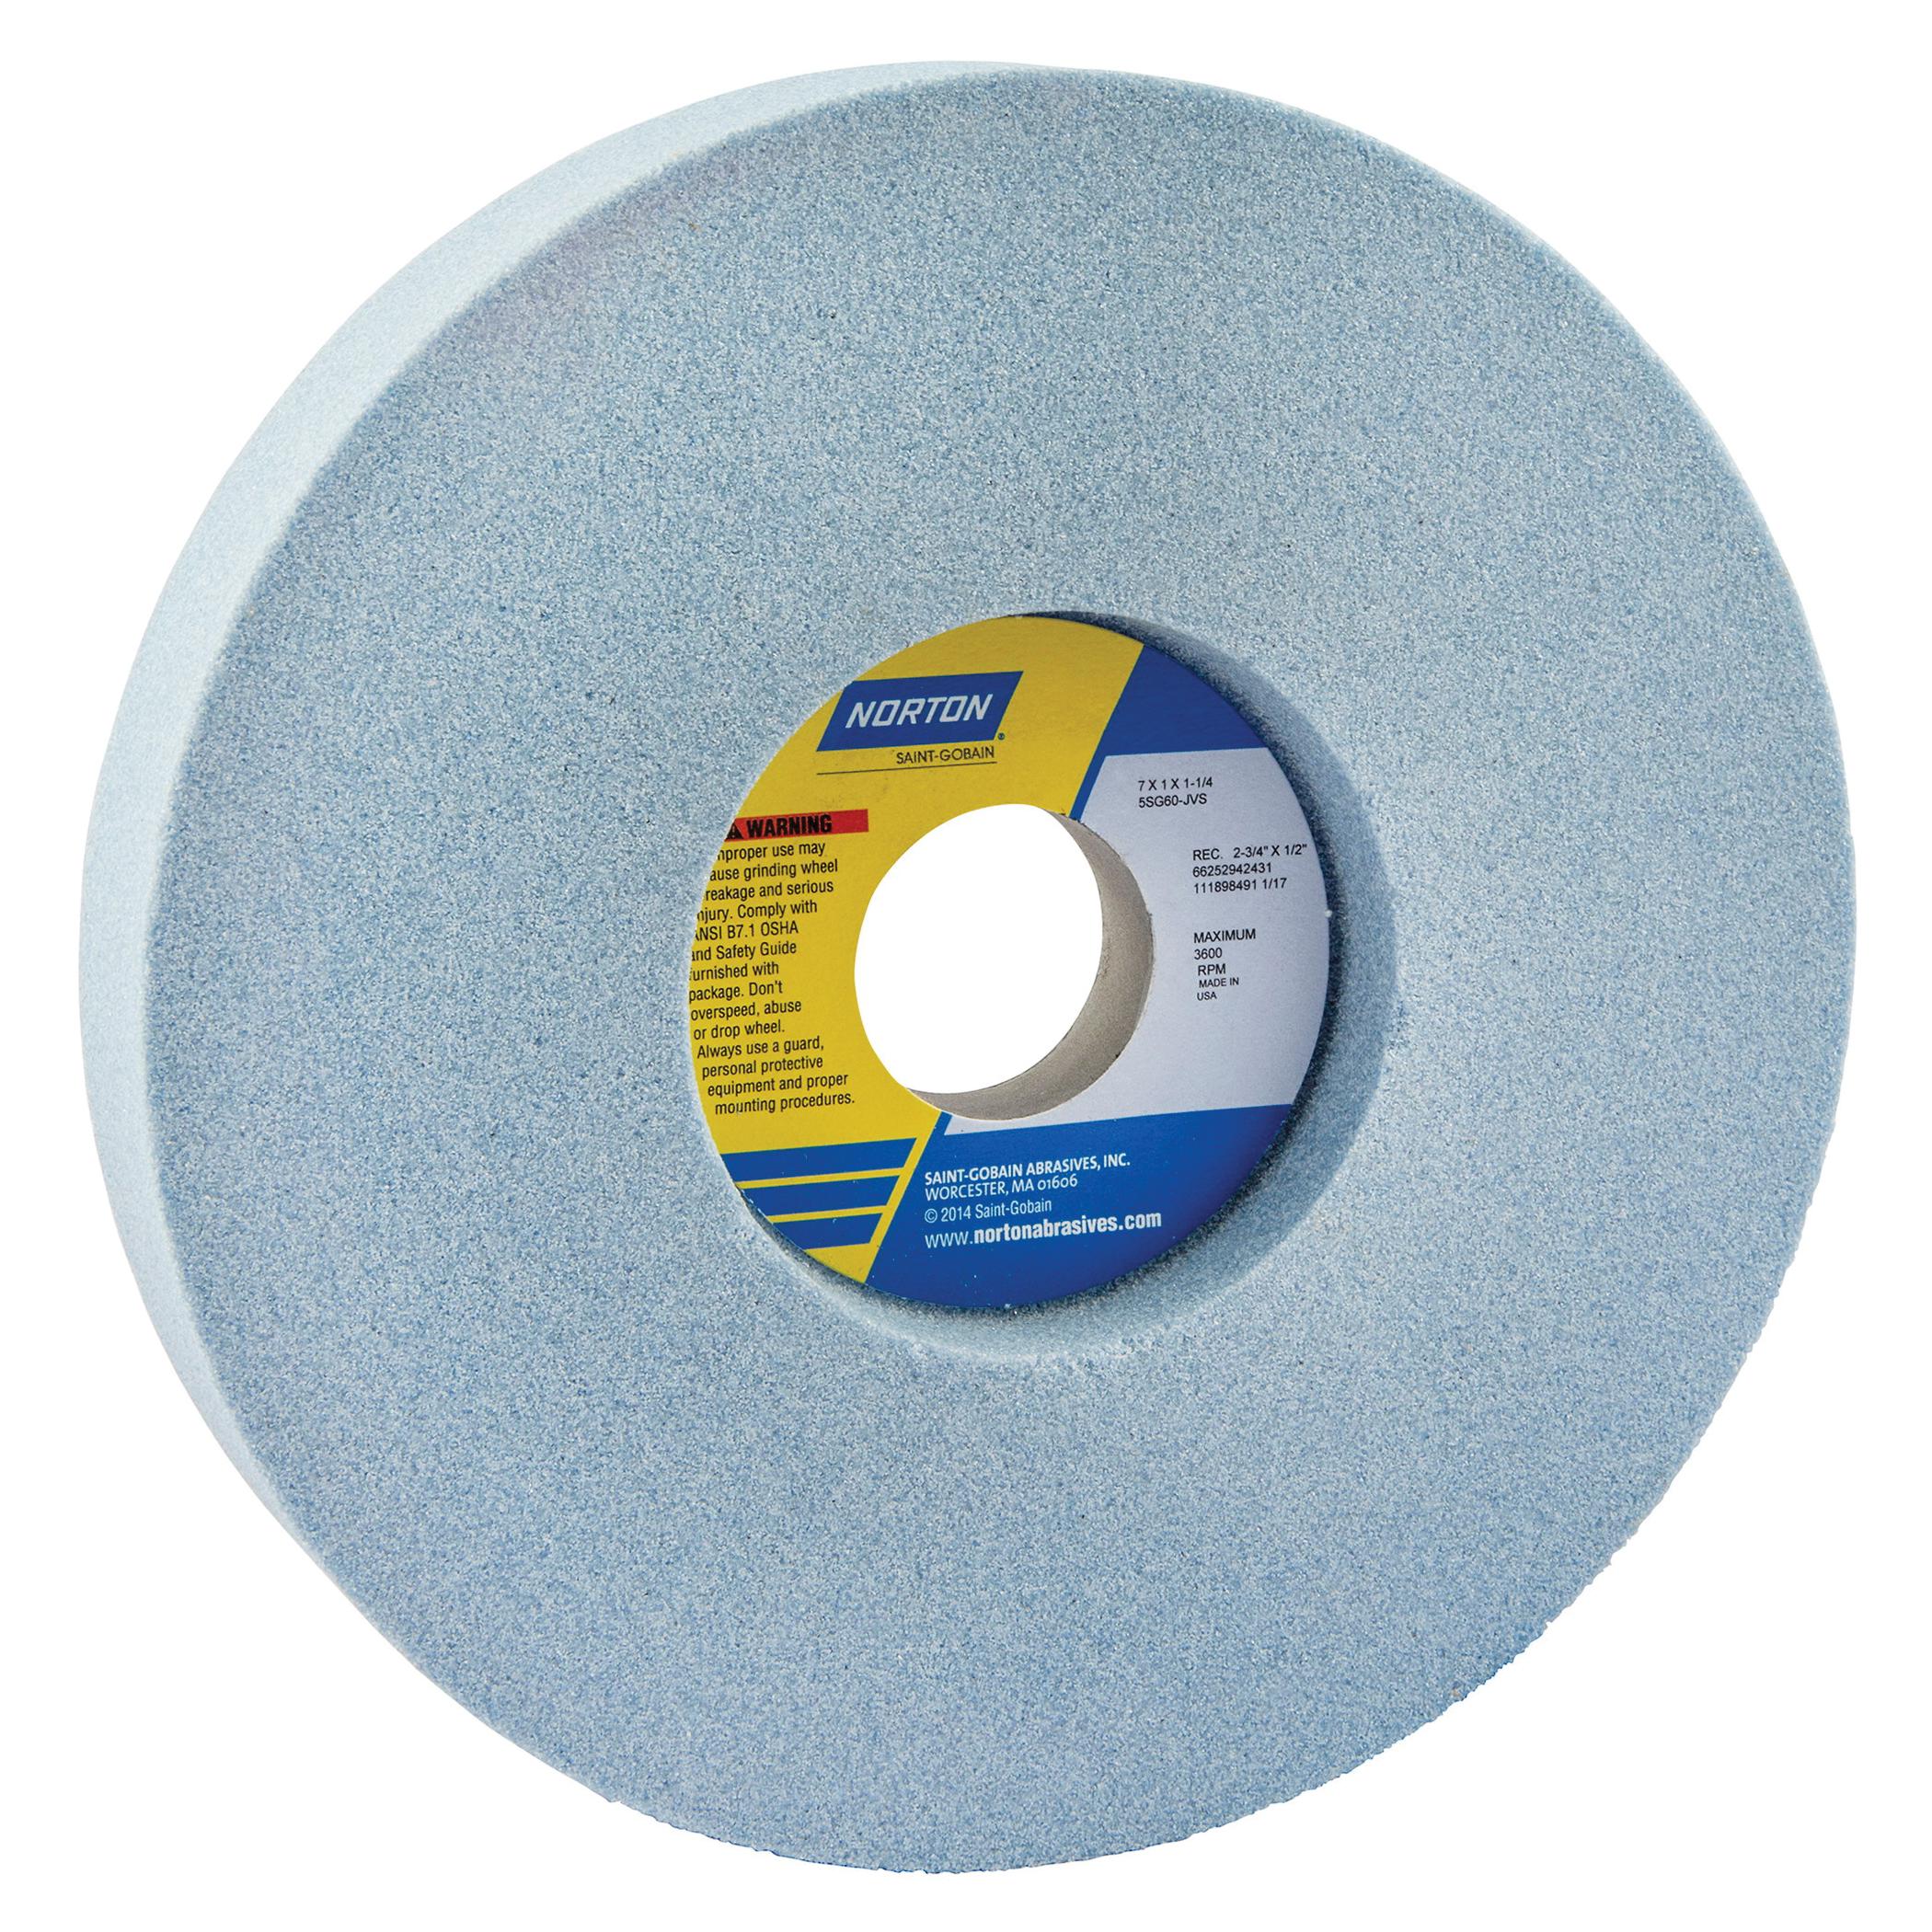 Norton® 66252942431 5SG 1-Side Recessed Toolroom Wheel, 7 in Dia x 1 in THK, 1-1/4 in Center Hole, 60 Grit, Ceramic Alumina/Friable Aluminum Oxide Abrasive